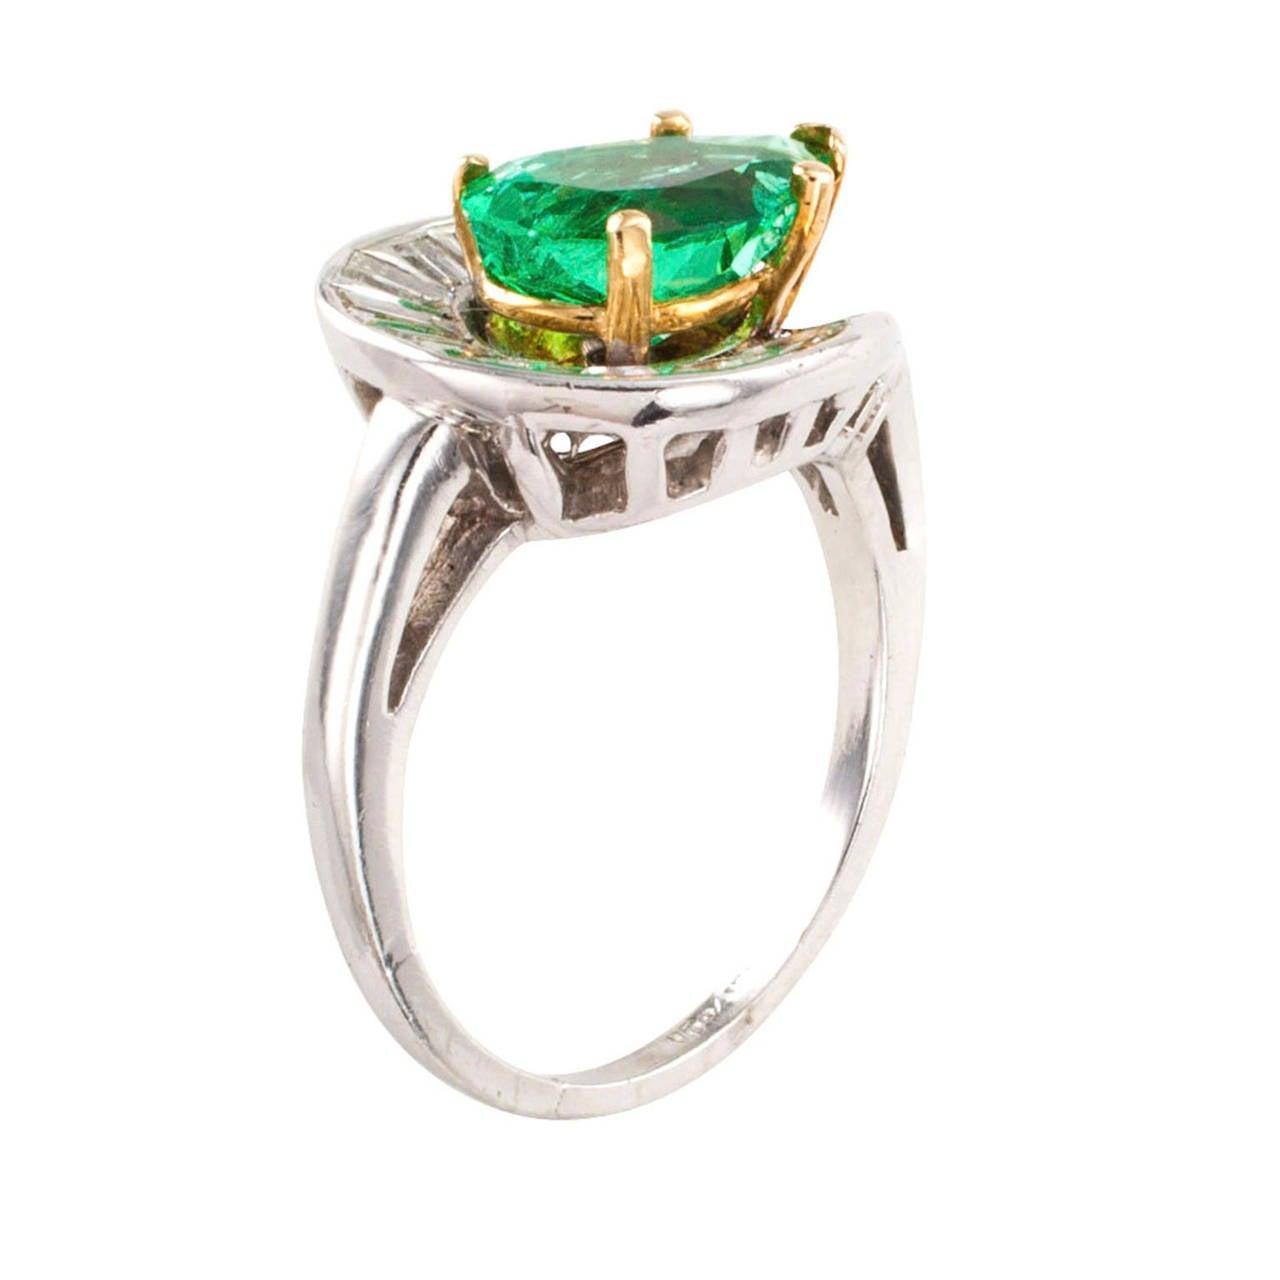 pear shaped emerald and ring circa 1950